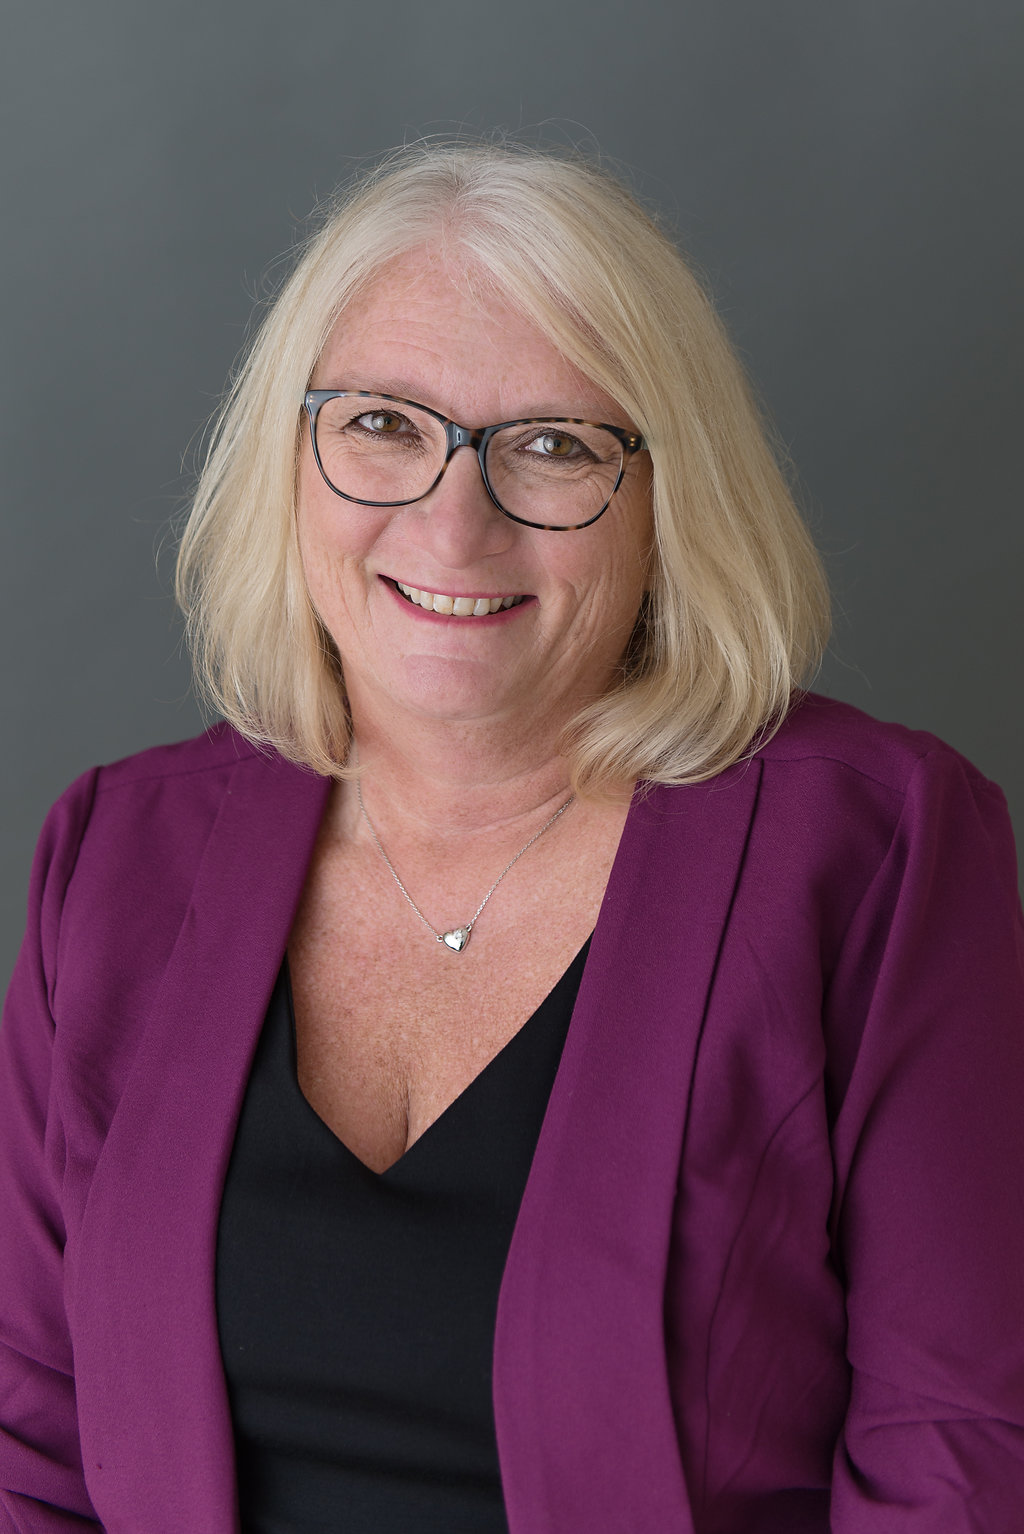 OPSBA President Cathy Abraham